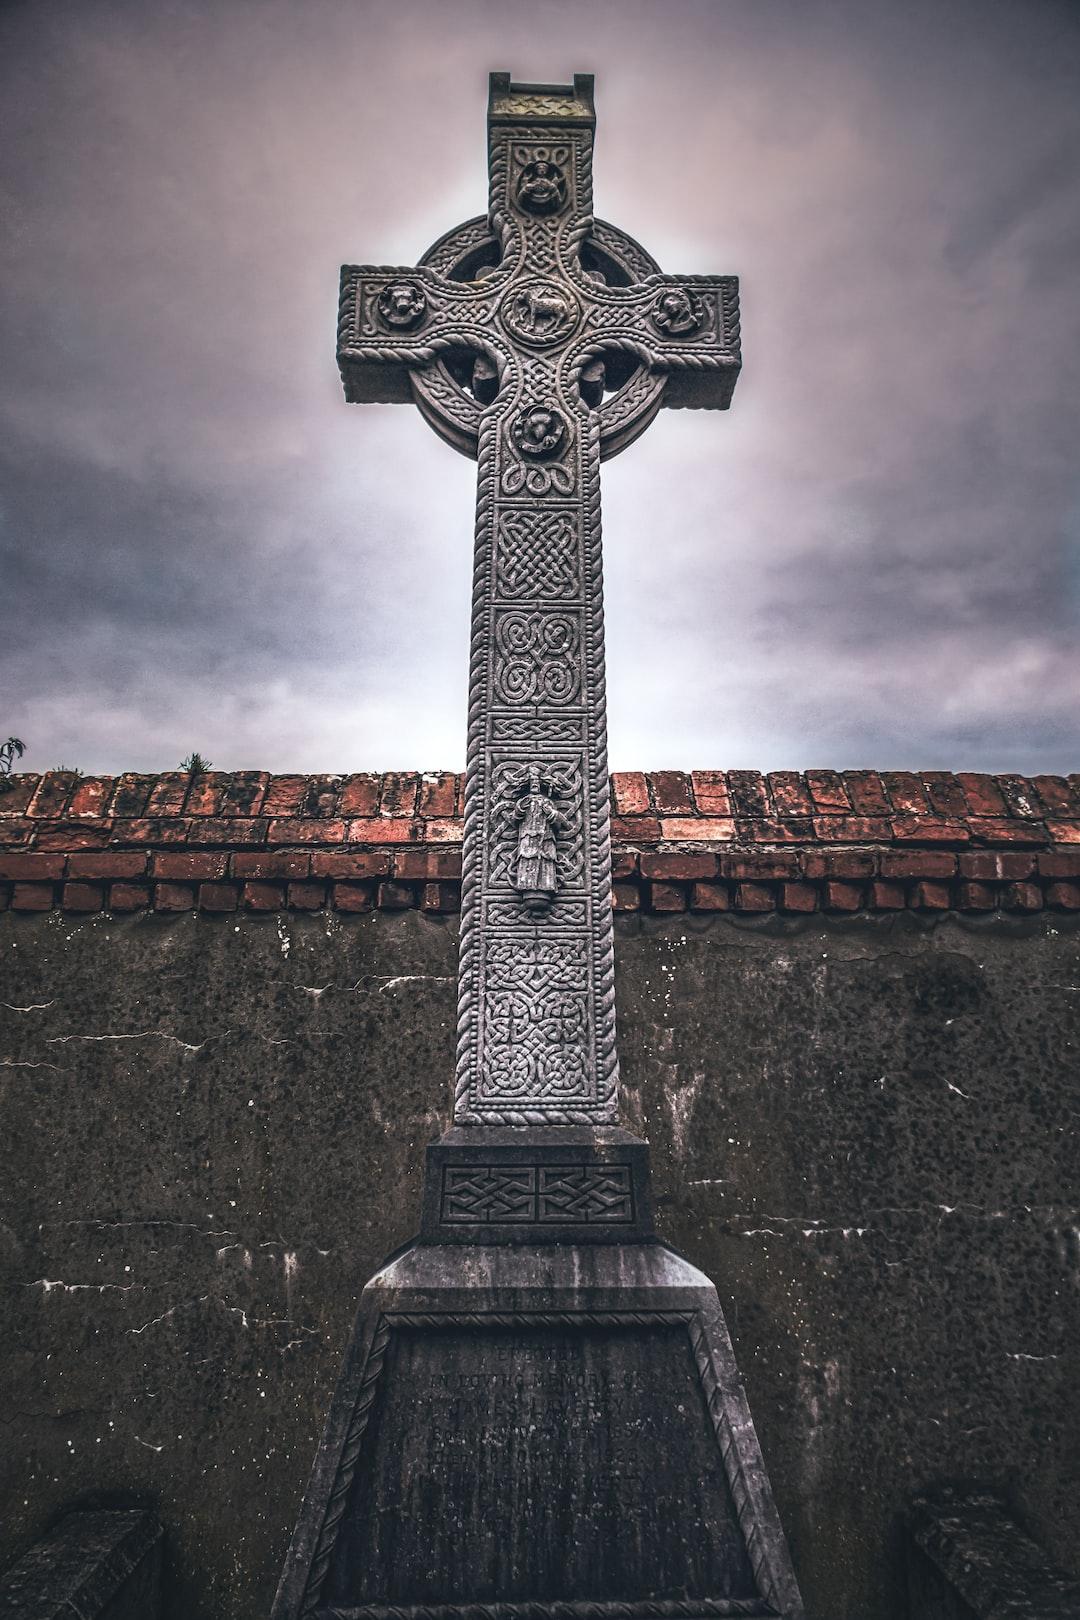 An ornate Celtic cross in the graveyard on the grounds of St. Nicholas' Church of Ireland Parish in Carrickfergus, County Antrim (Jan., 2020).